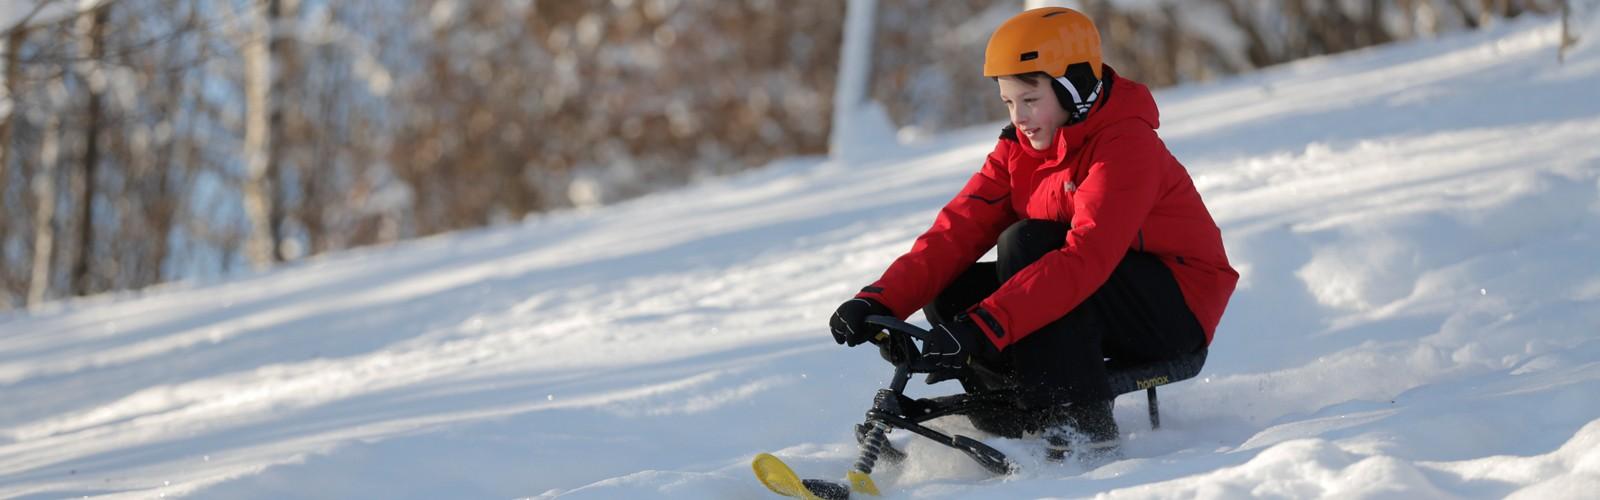 Hamax snow sledges children having fun